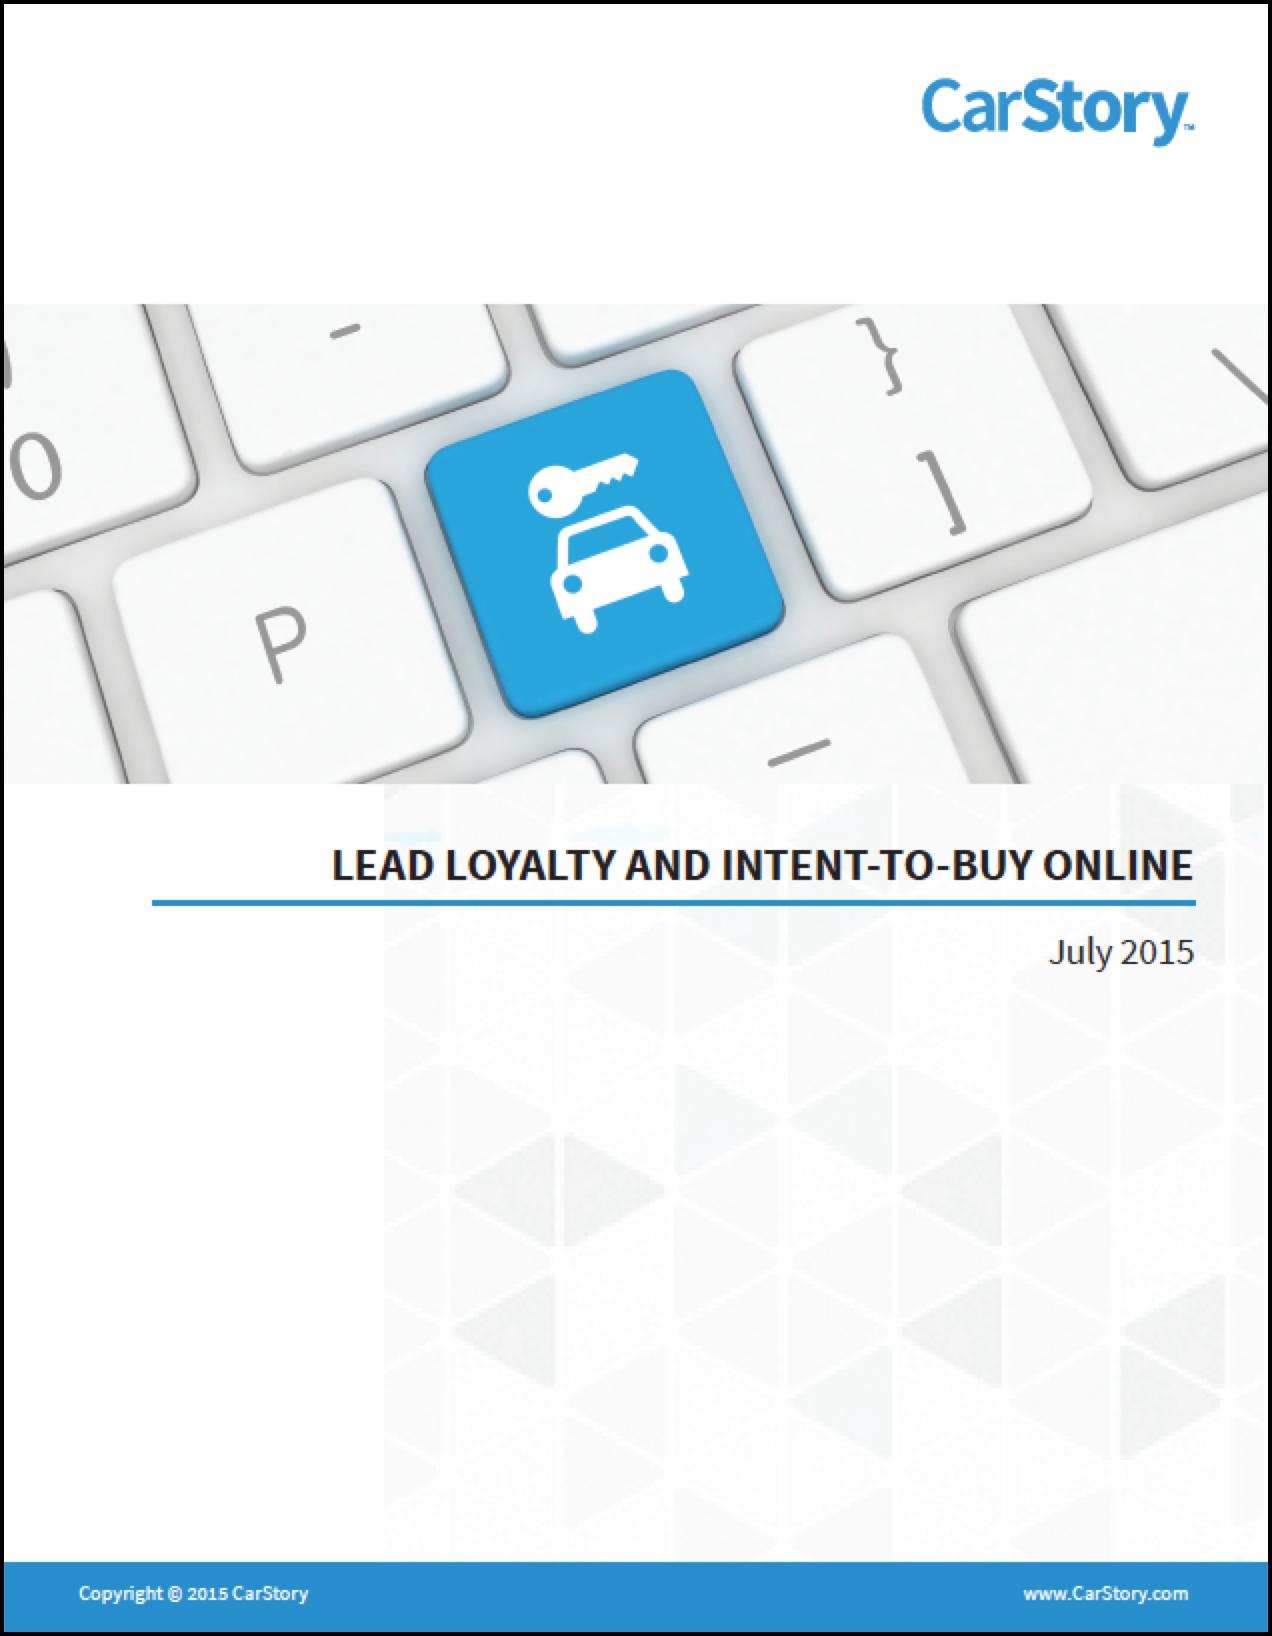 LeadLoyalty.png